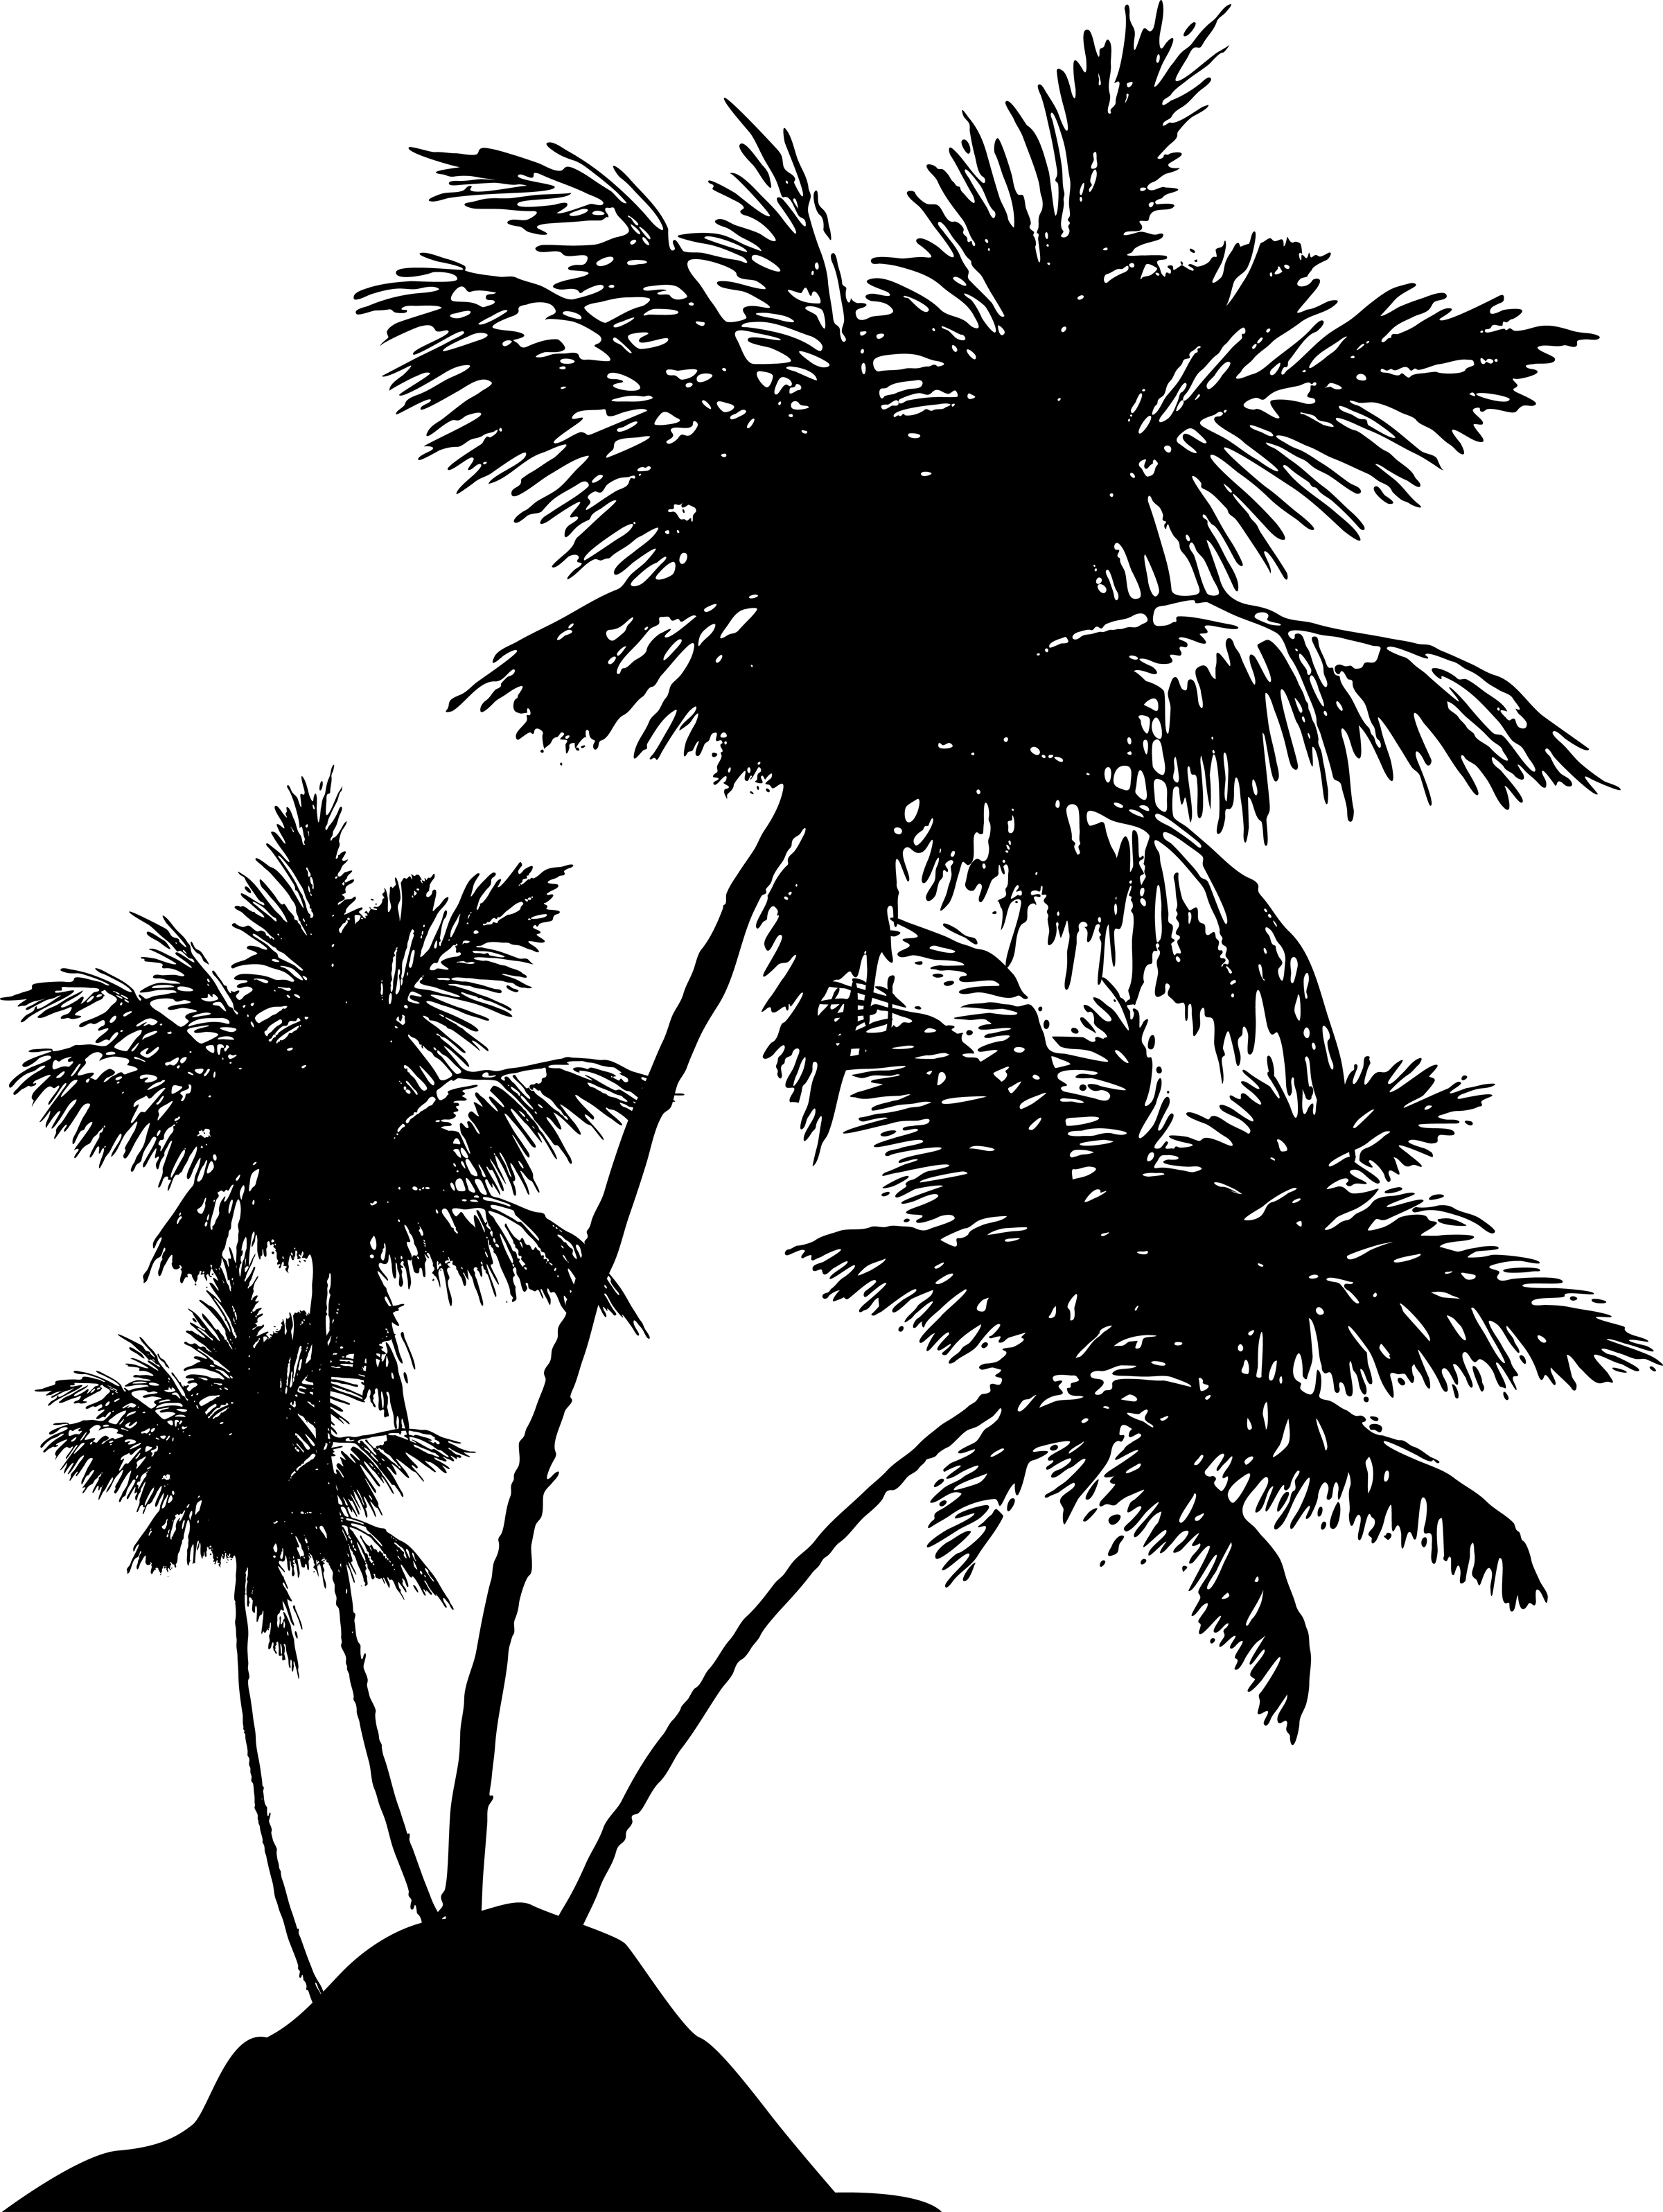 jpg transparent stock Silhouette cakepins com image. Boats drawing palm tree